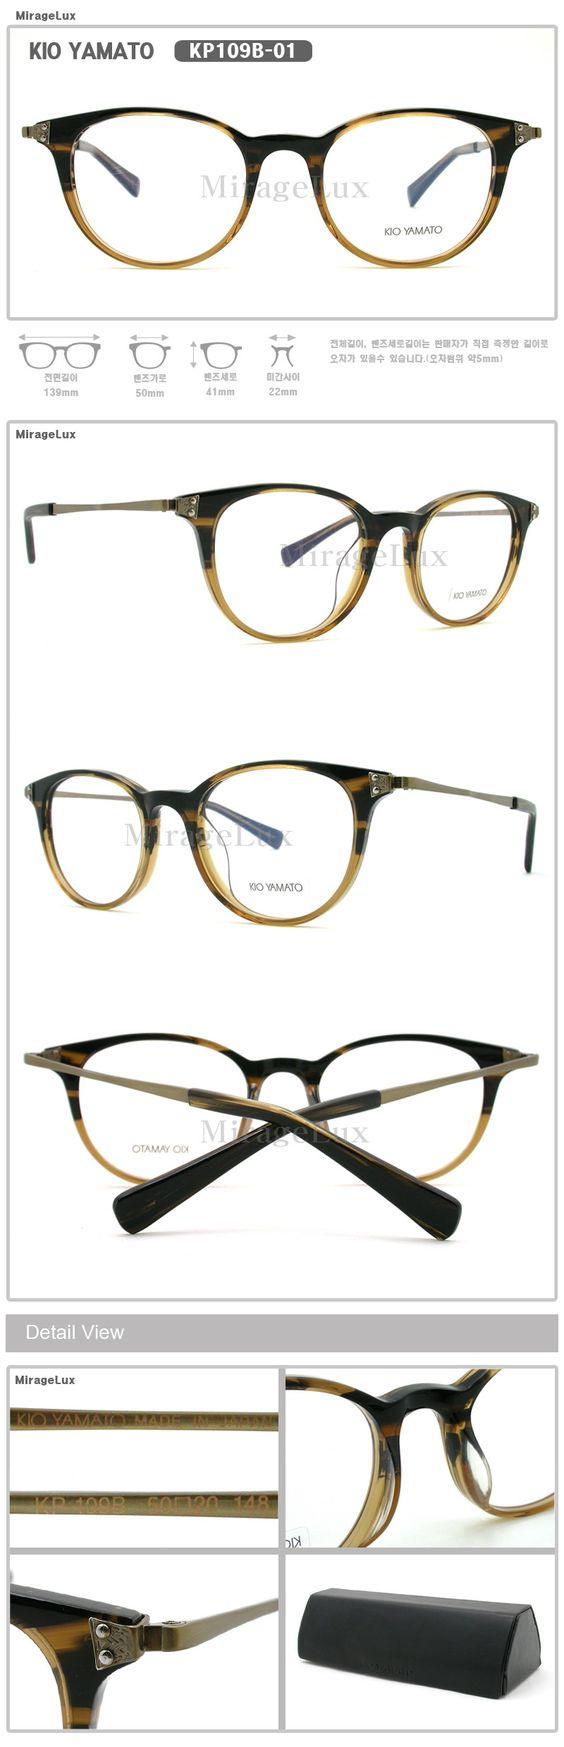 Kio Yamato Eyeglasses Frames : KIO YAMATO KP109B-01,02,03,04 Other Brand Favorite ...